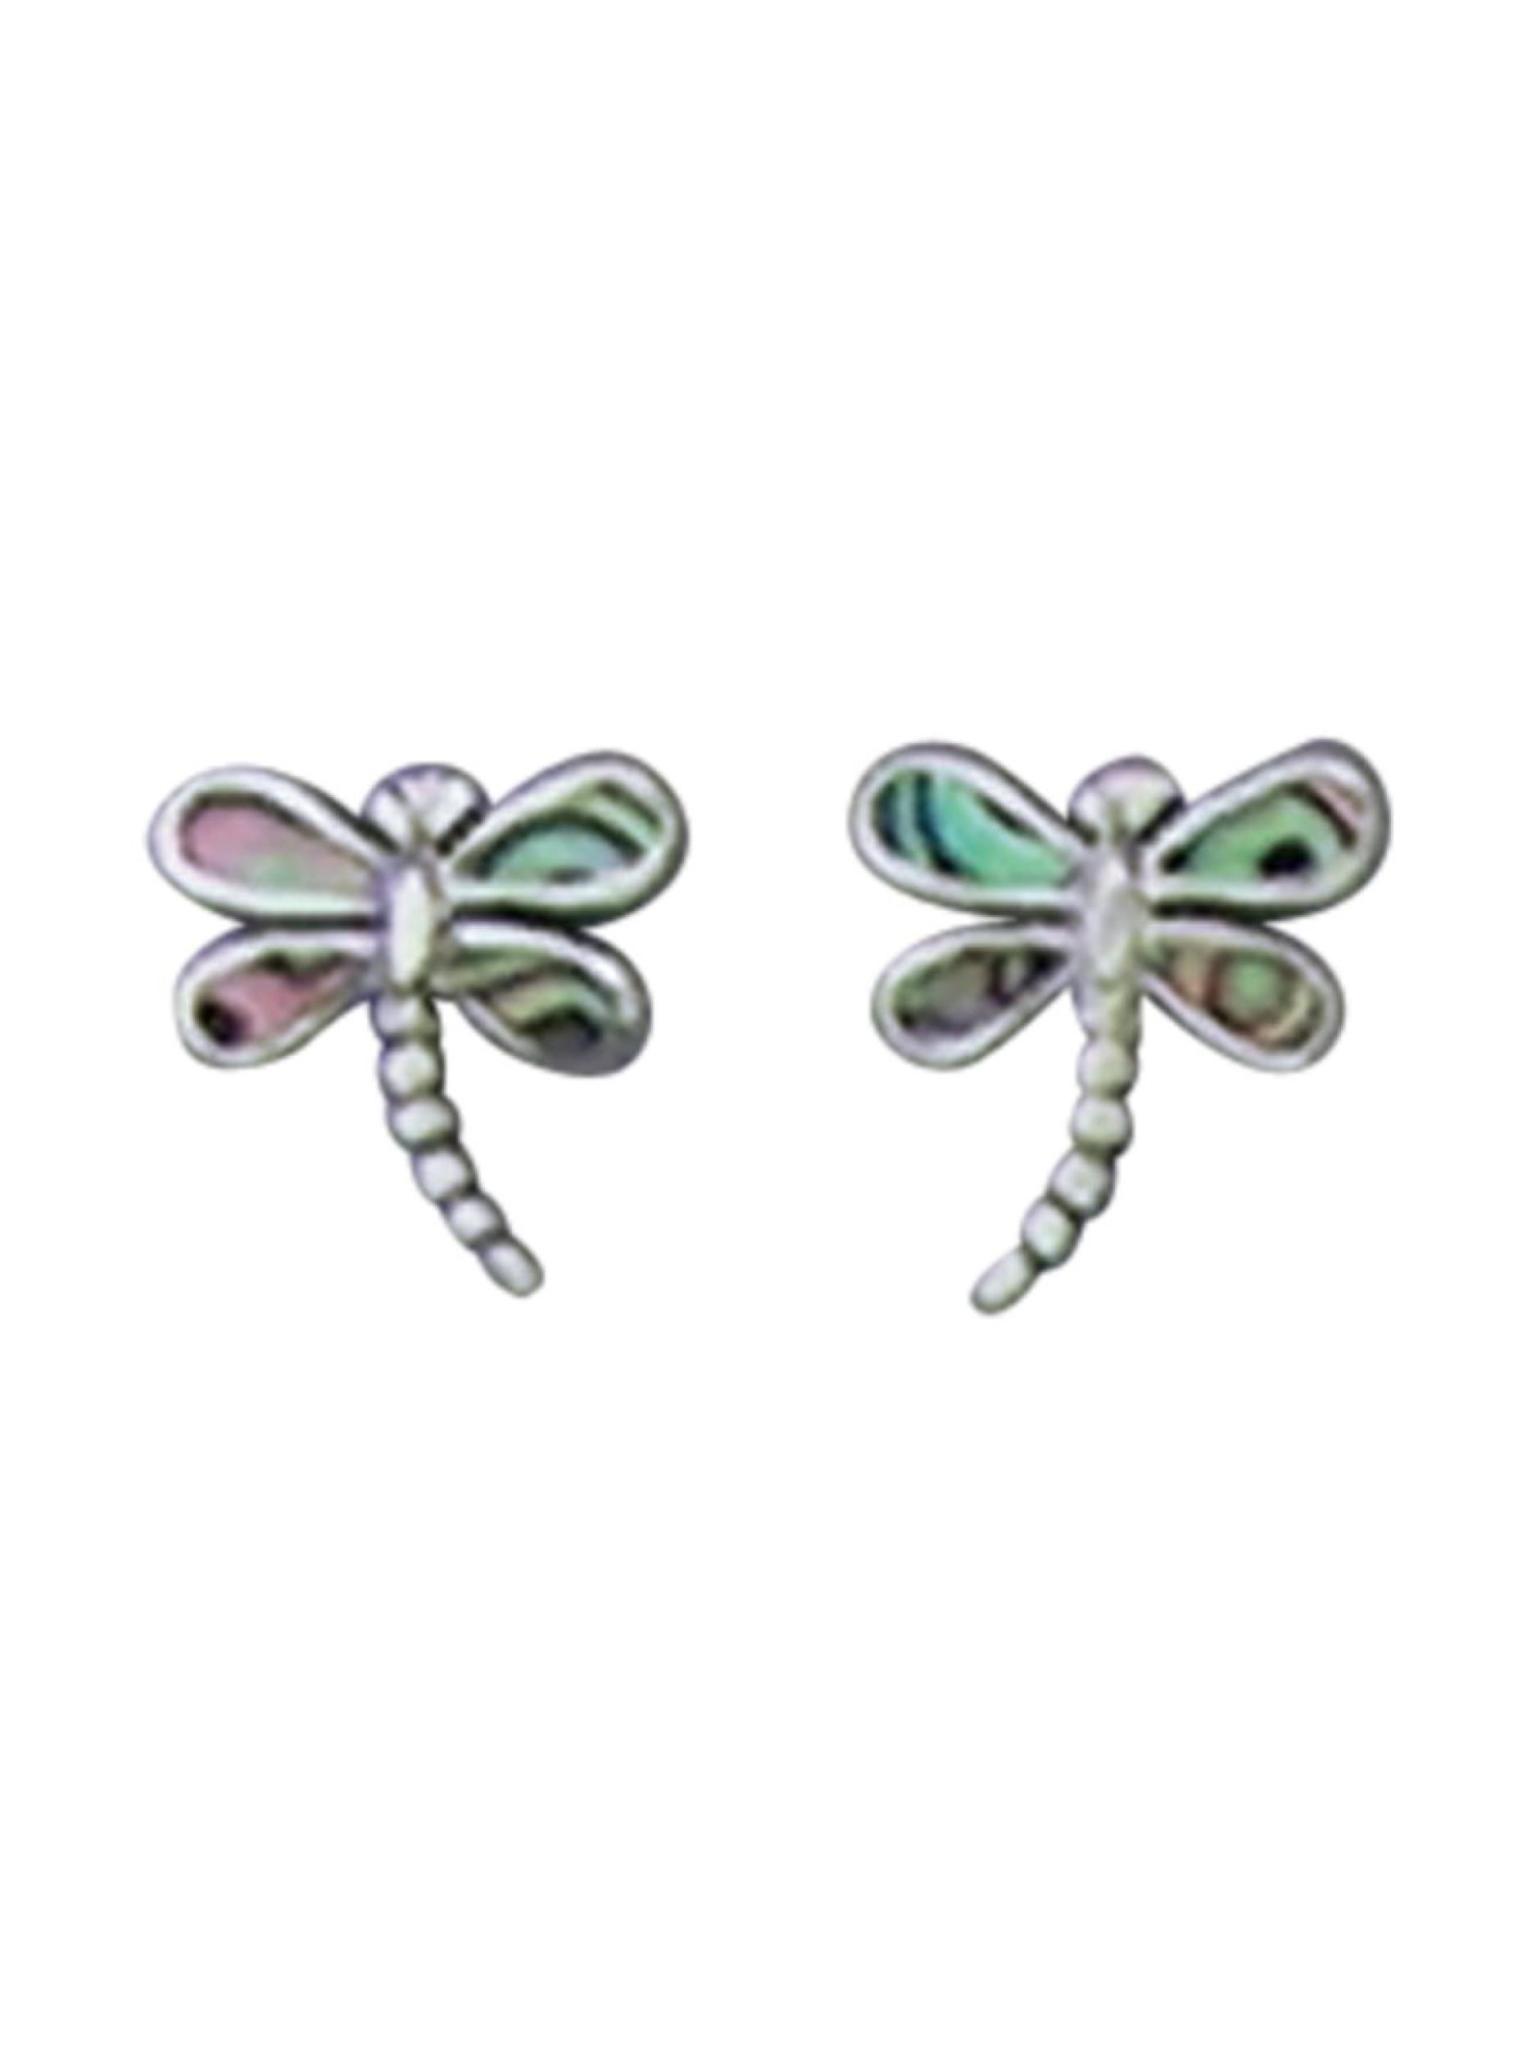 Acomo Jewelry Abalone Dragonfly Ear Stud